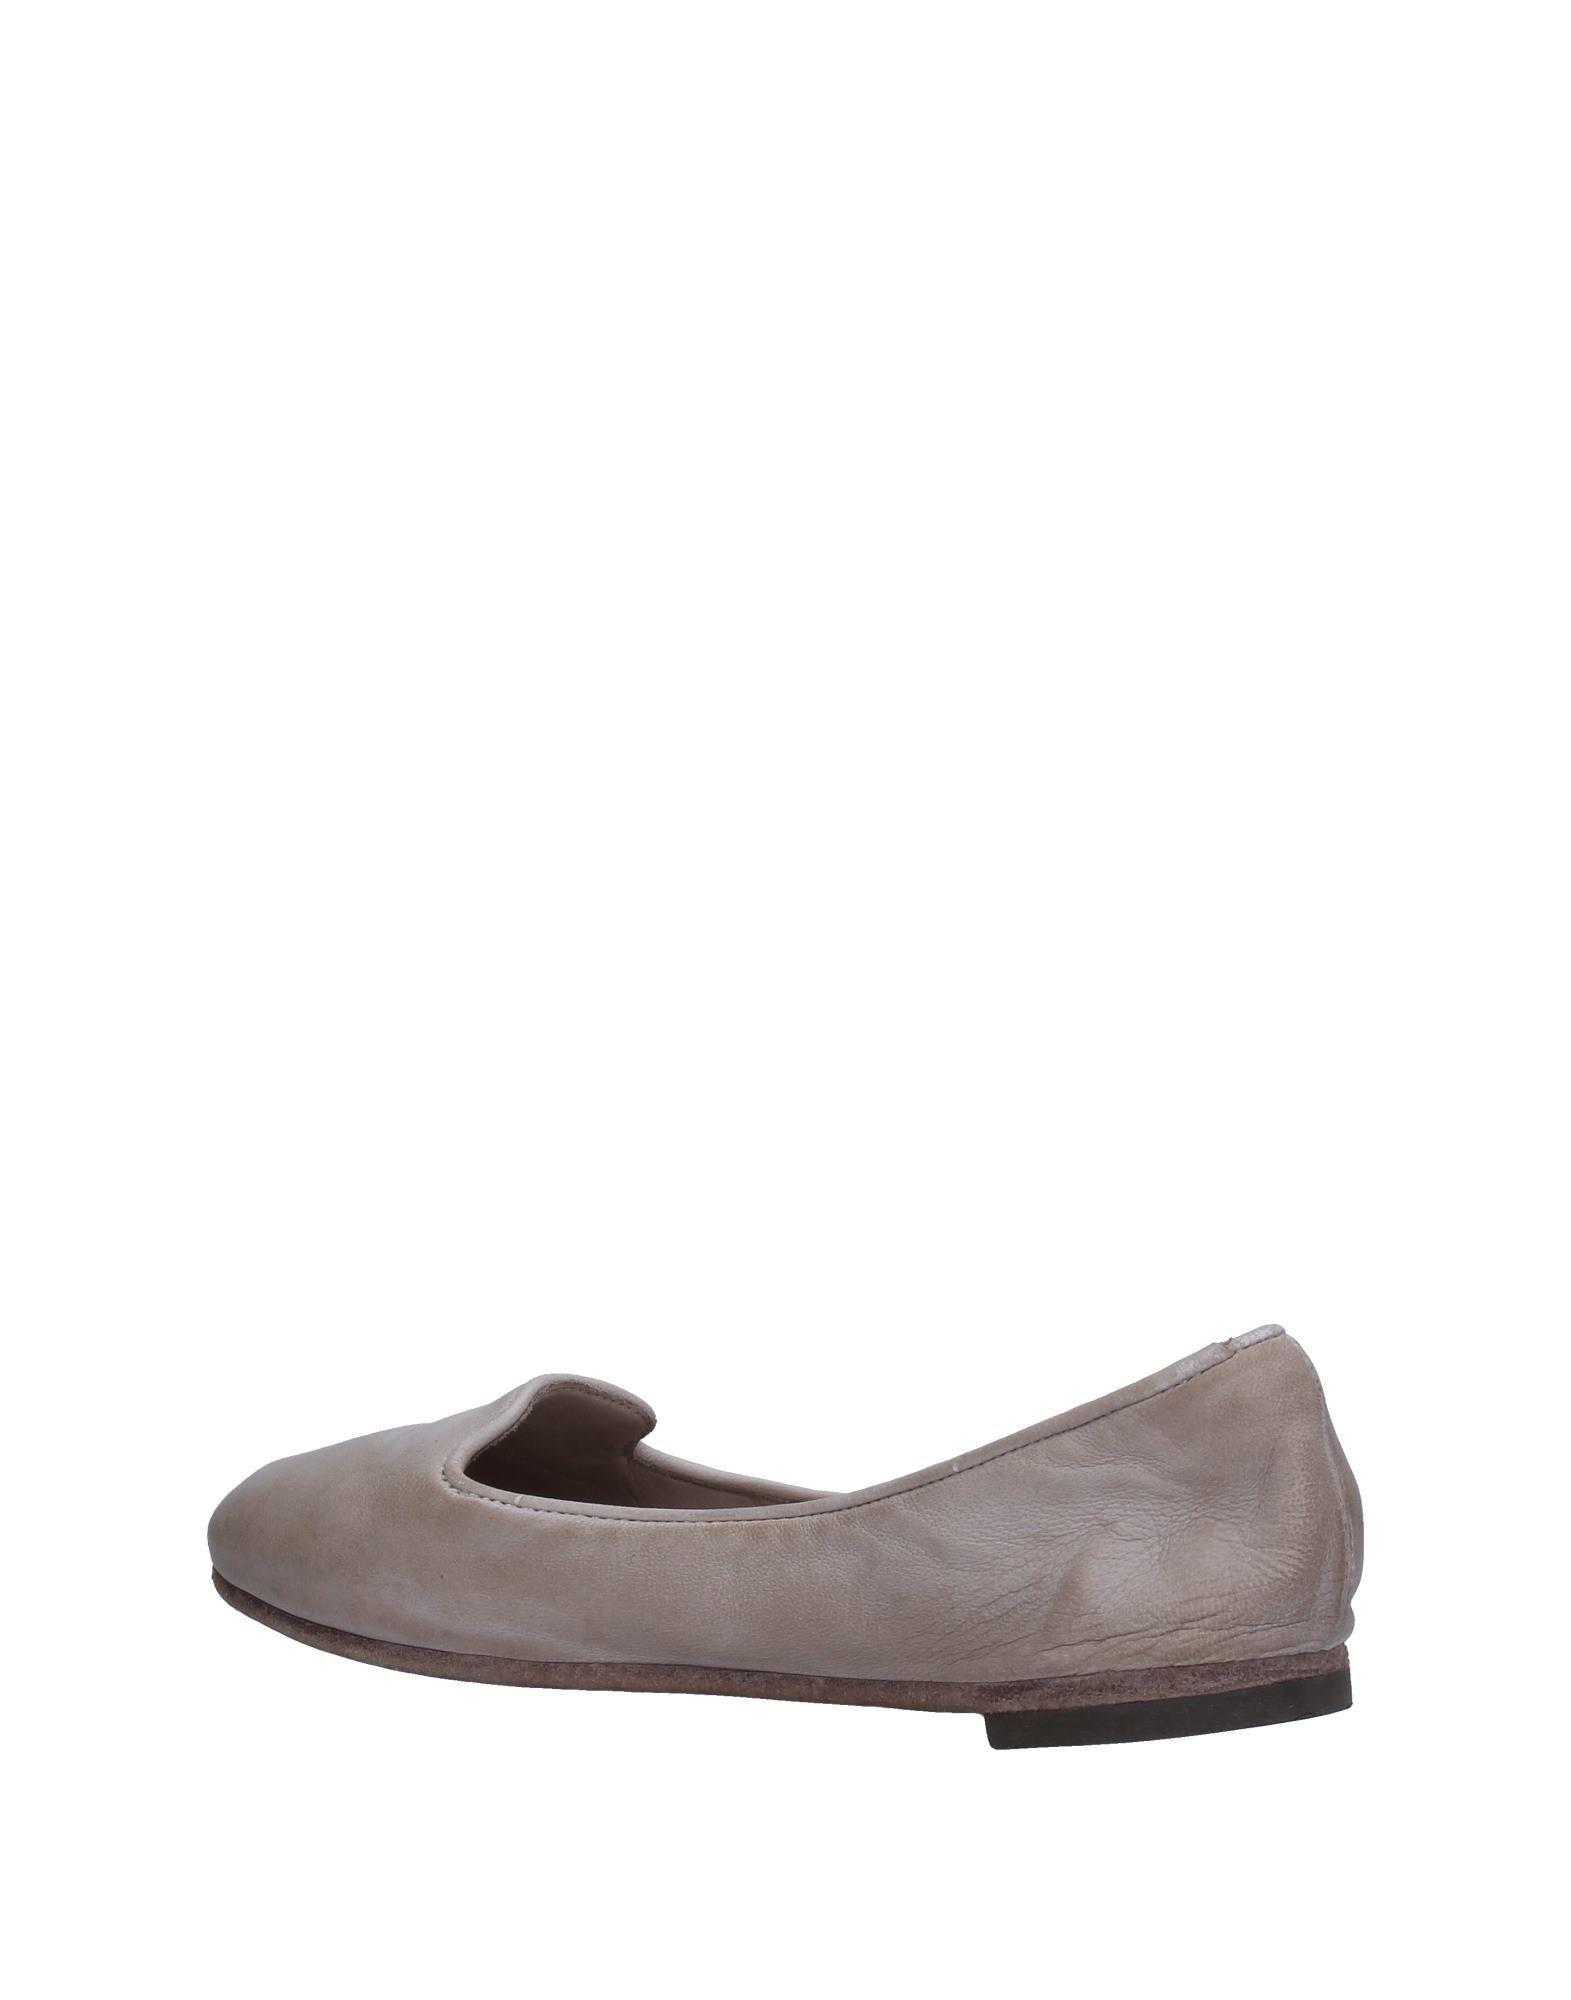 Mocassins Pantofola Doro Femme - Mocassins Pantofola Doro sur